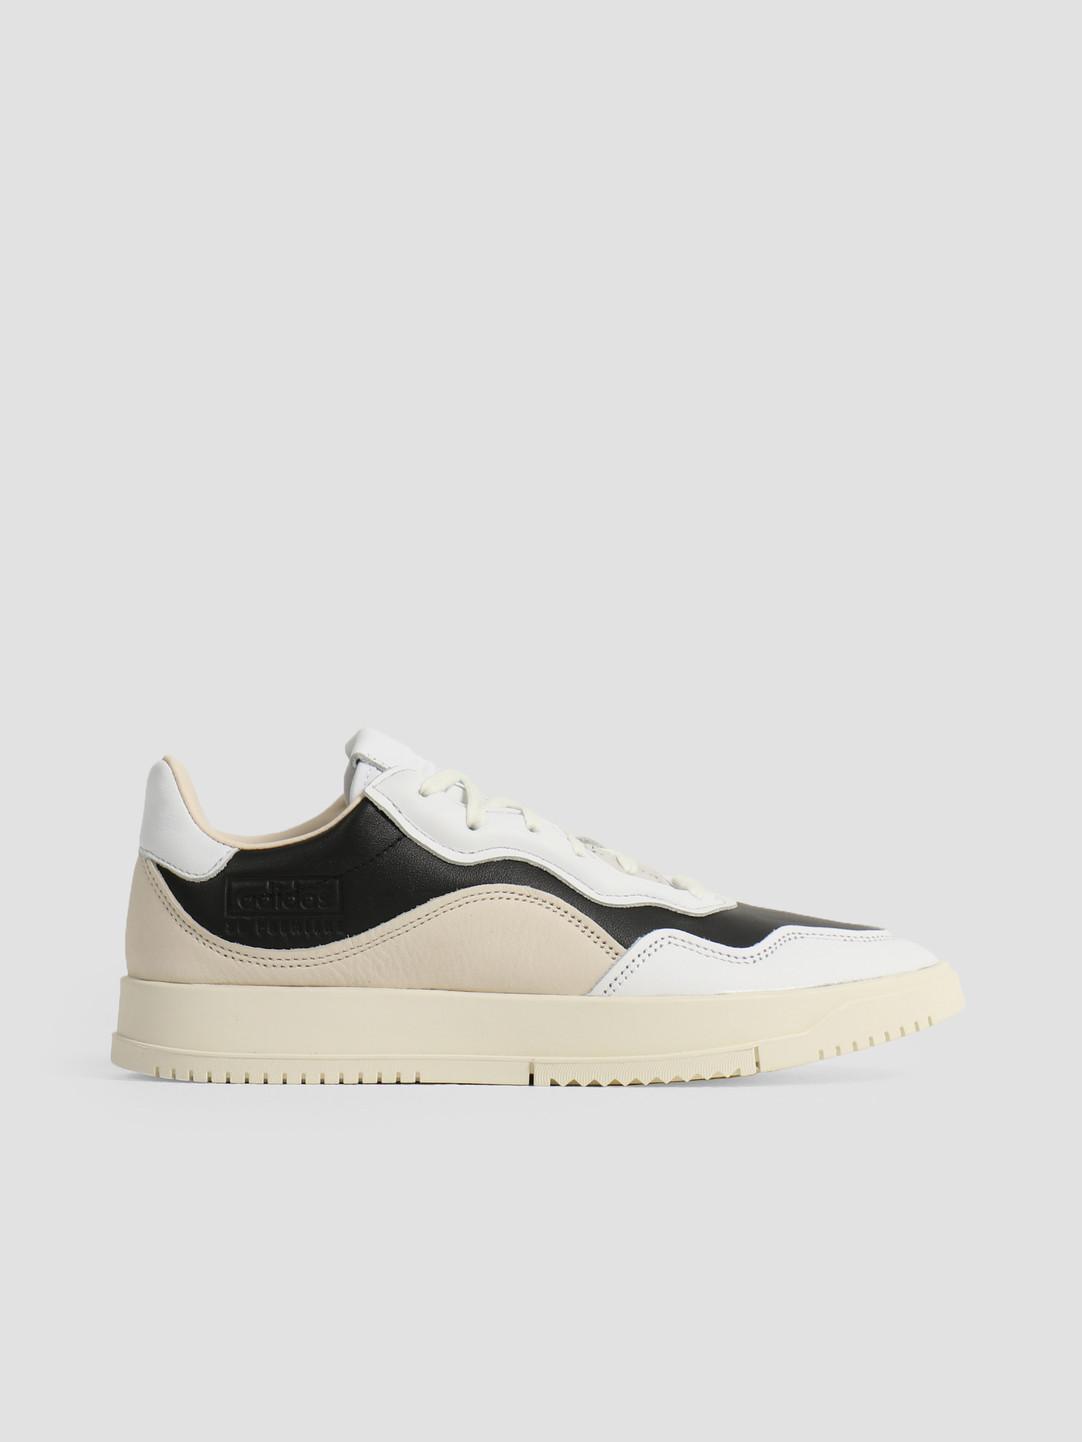 adidas Sc Premiere Footwear White Off